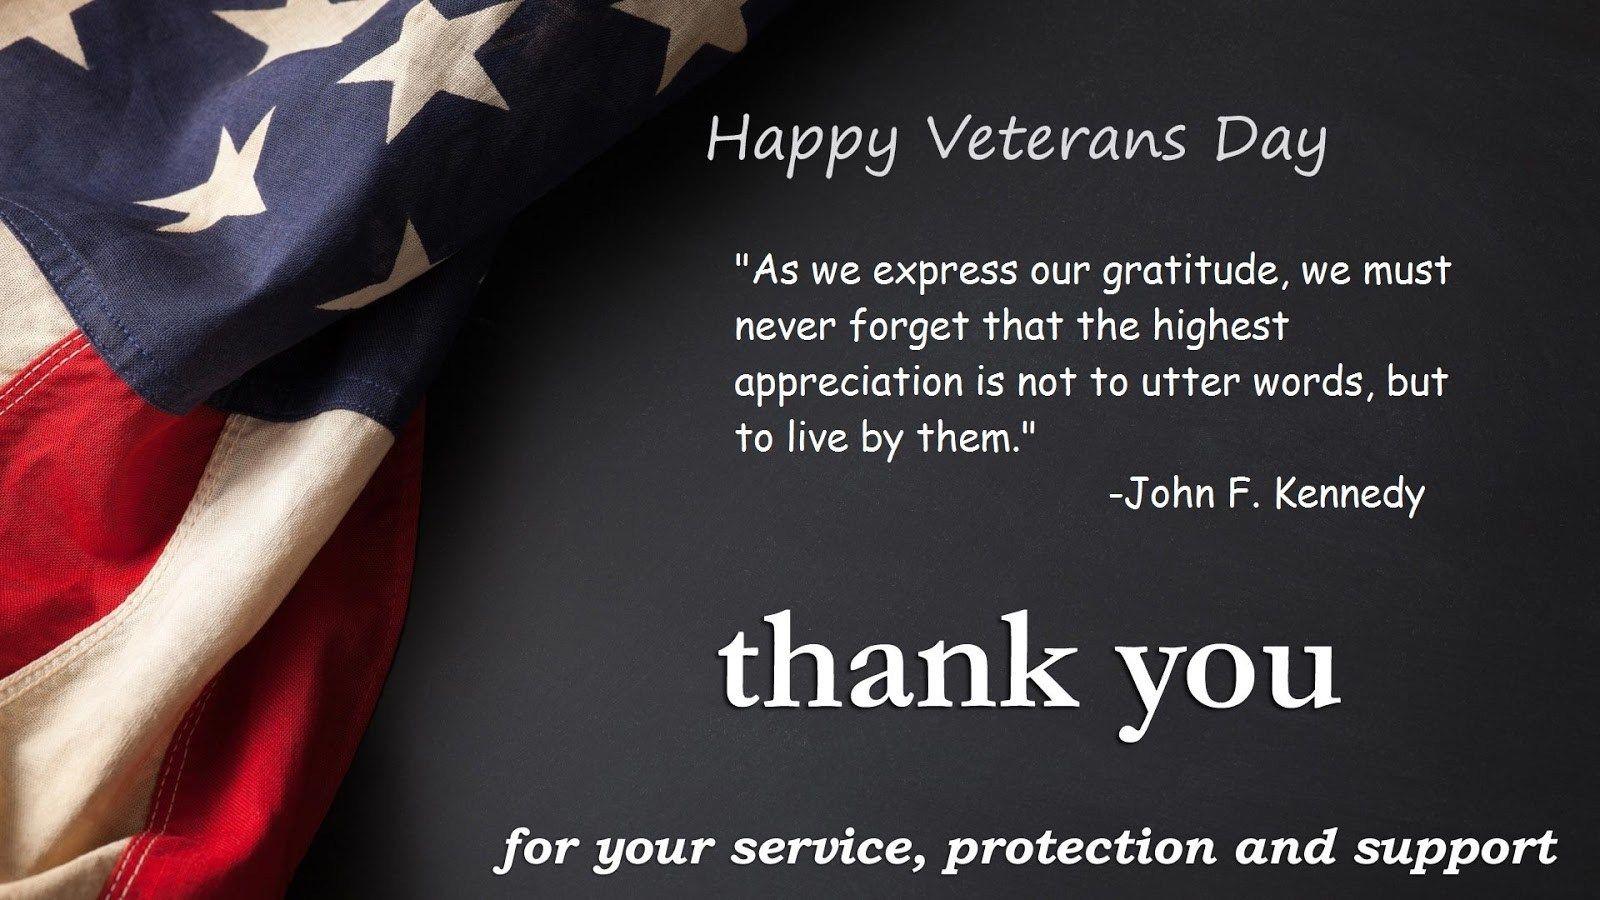 Top 20 veterans day quotes | Veterans day quotes, Happy ...